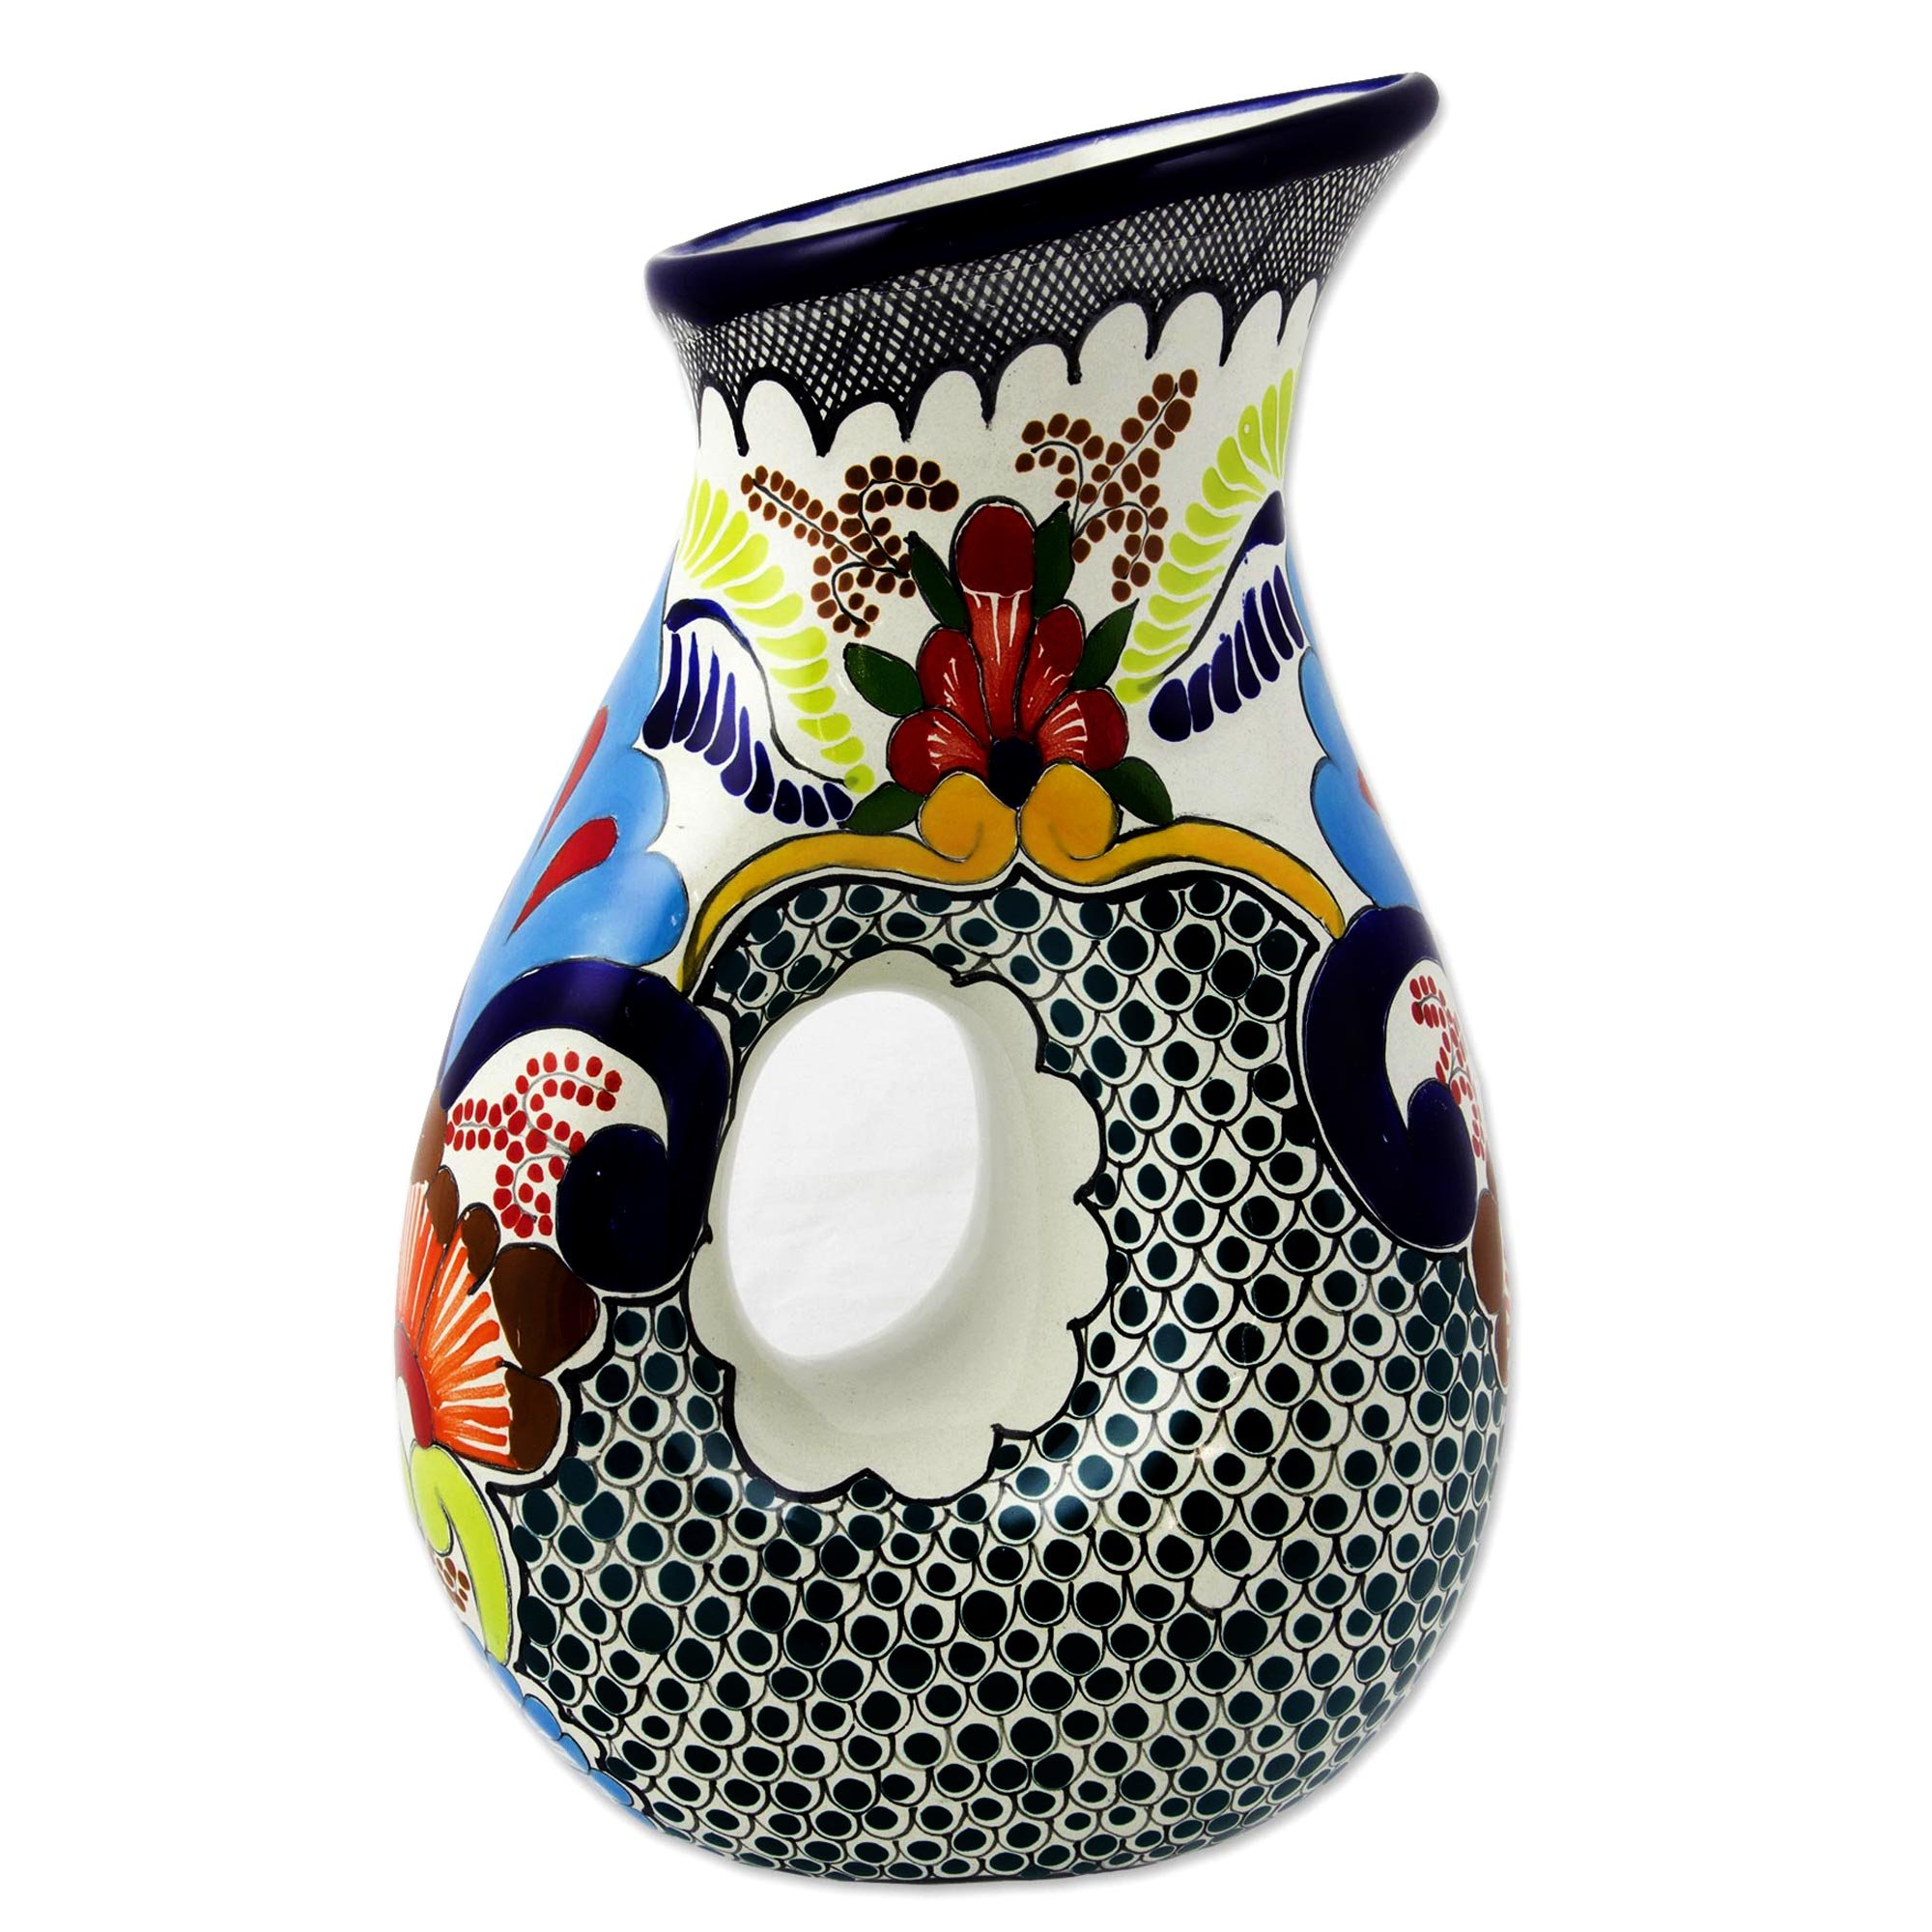 NOVICA Multicolor Floral Ceramic Pitcher, 47 oz. 'Blue Teziutlan' by NOVICA